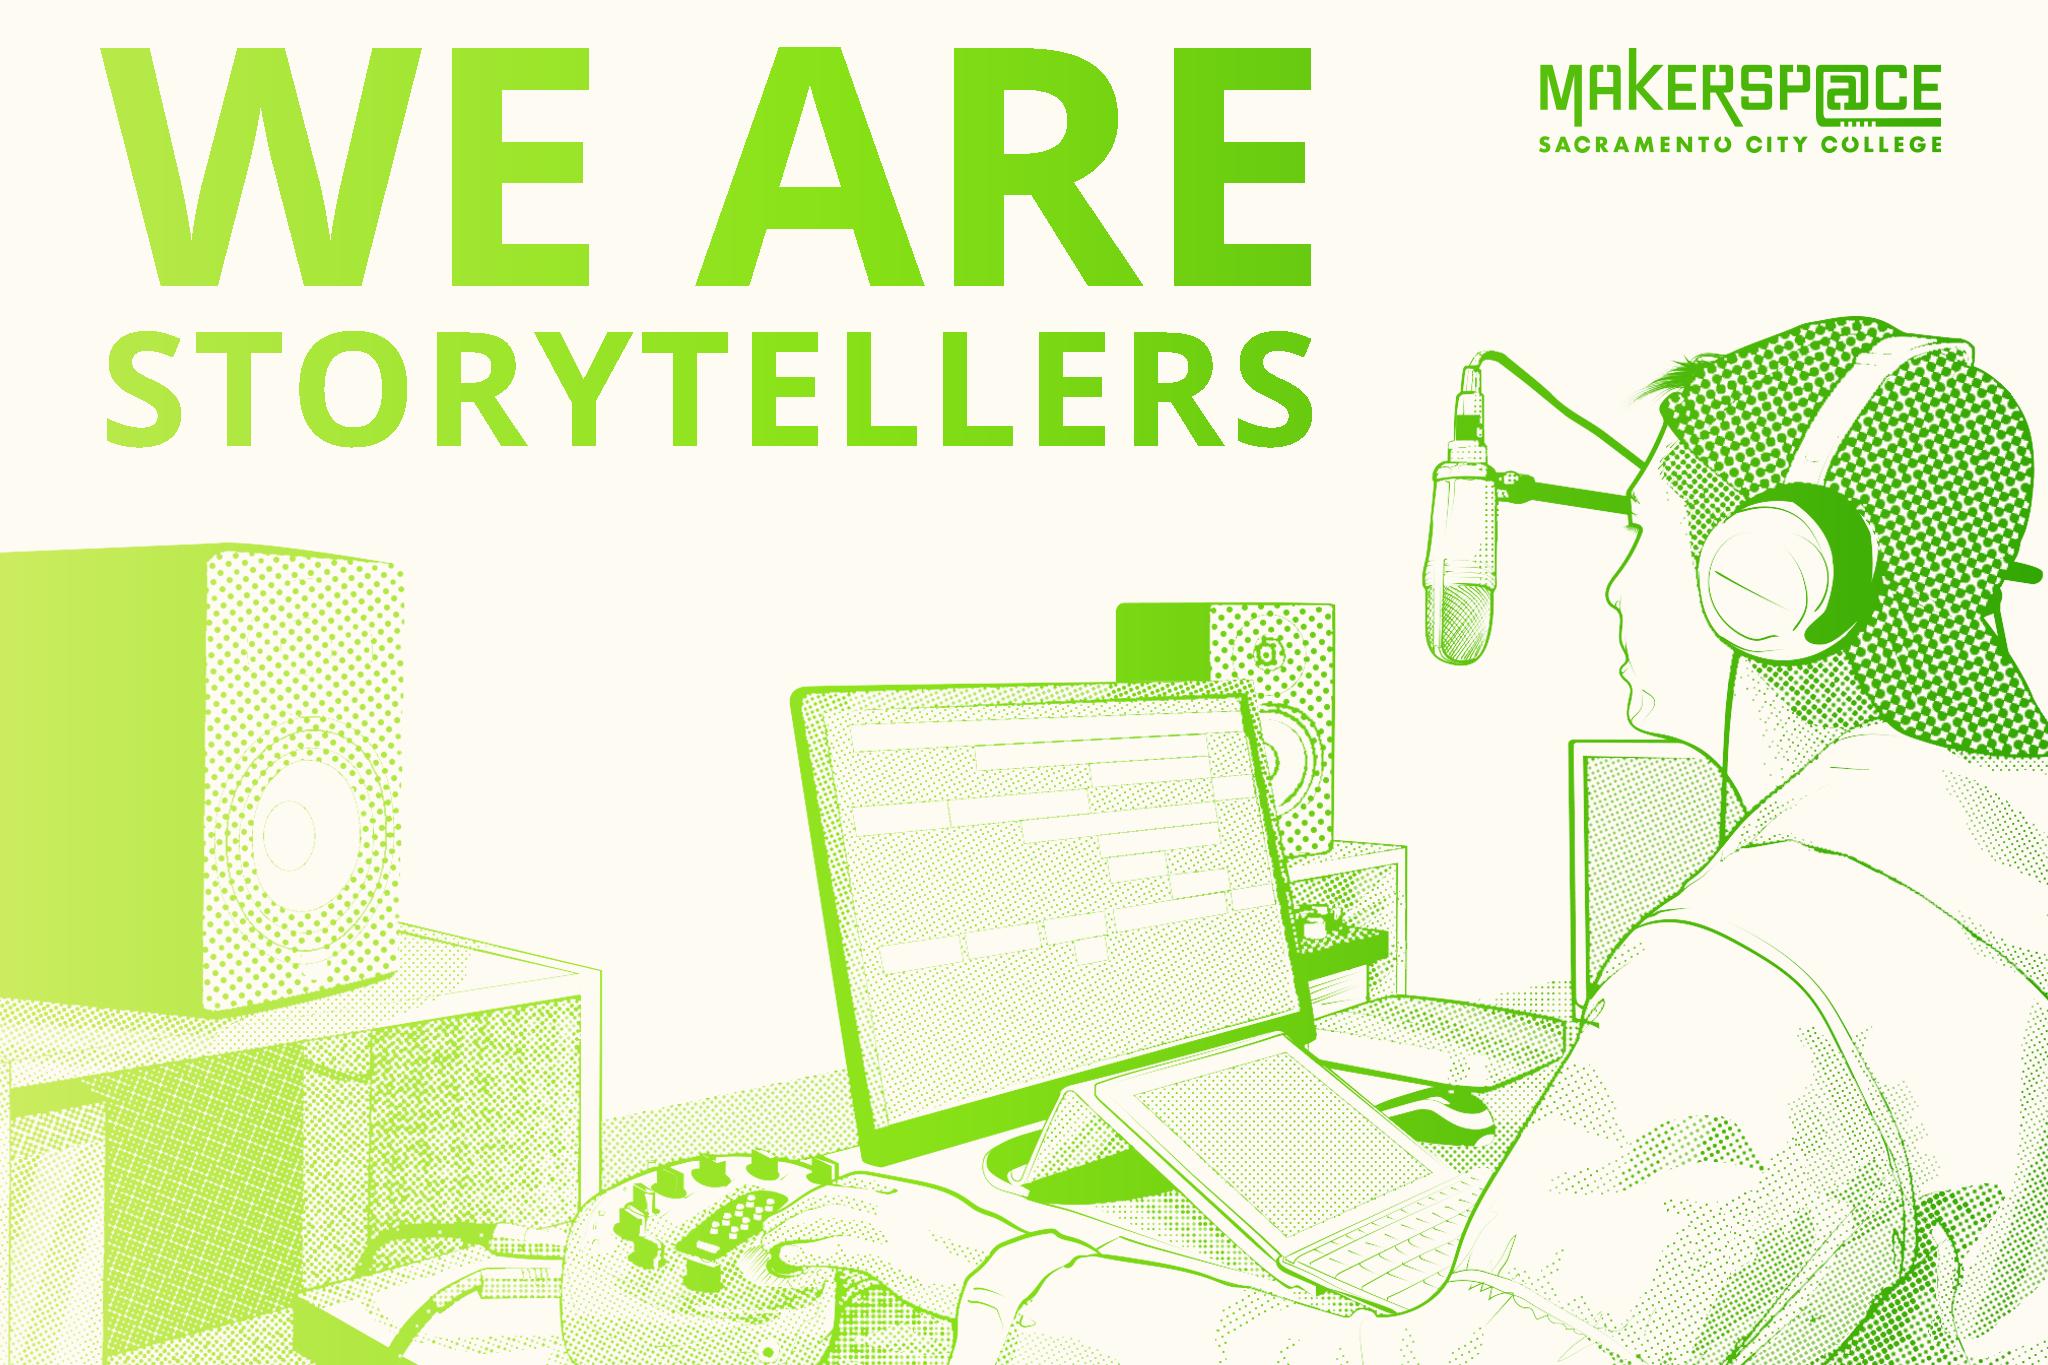 storytellers_banner.png